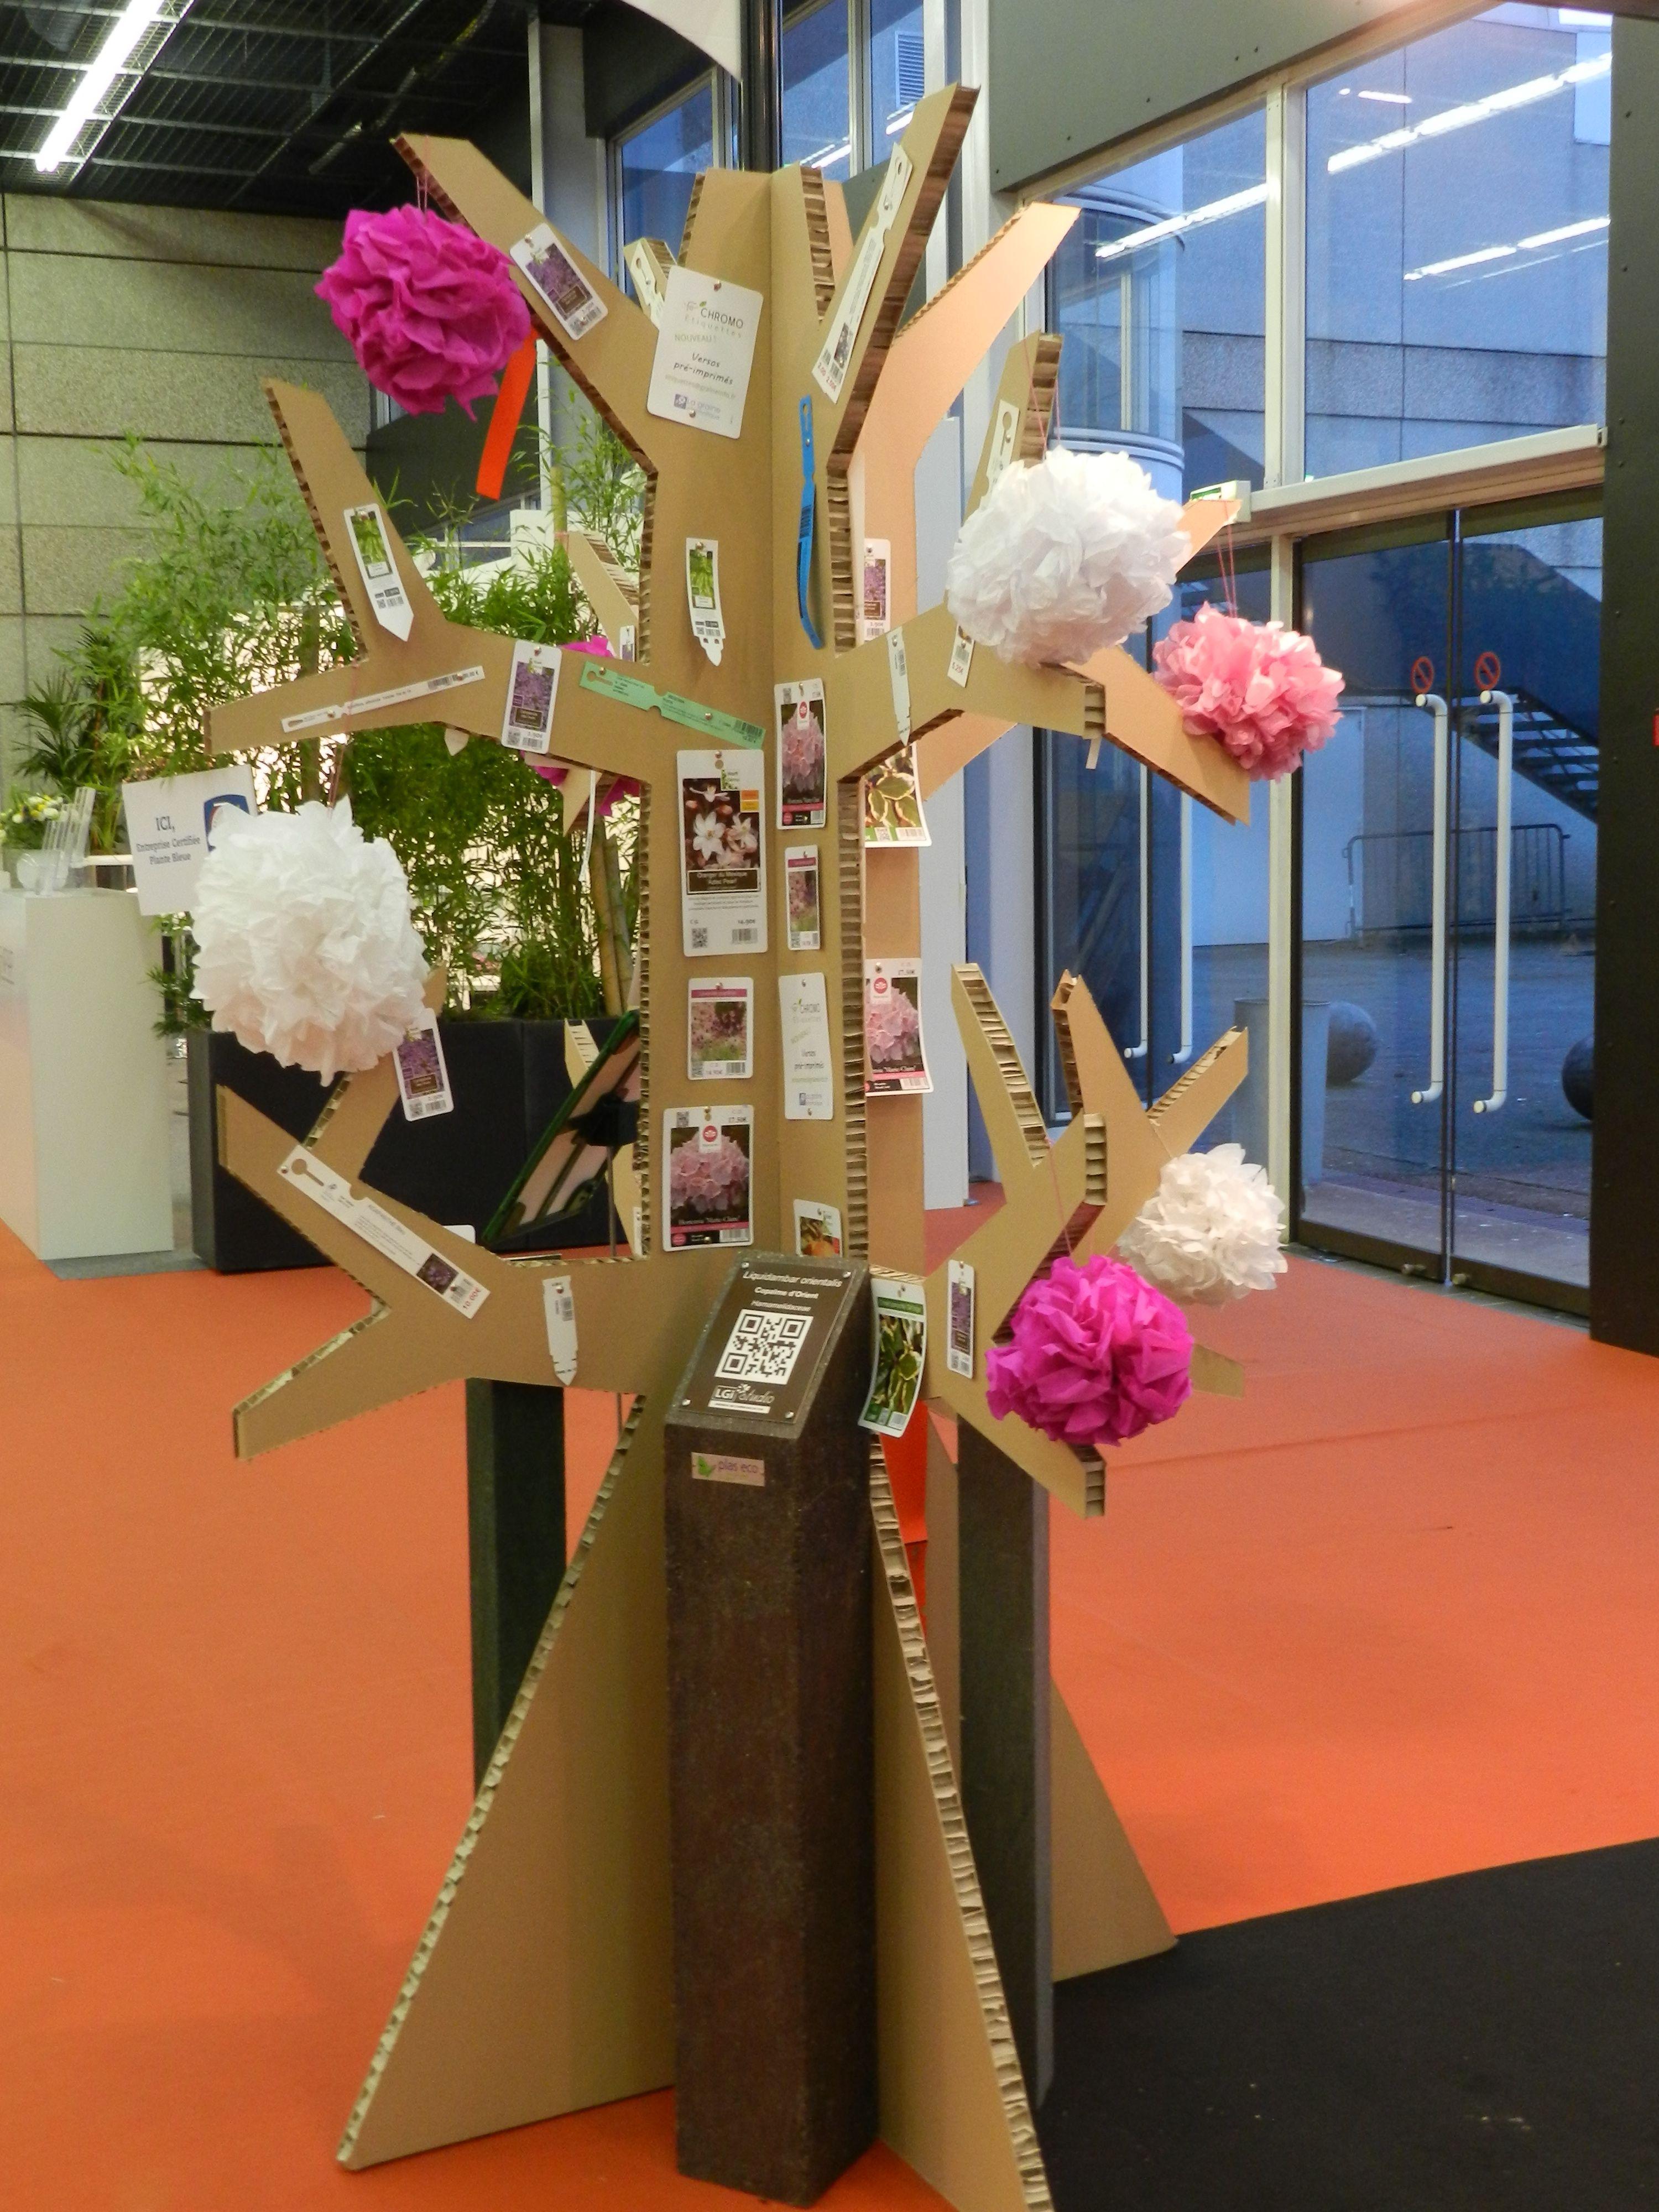 arbre en carton pinterest fabricant de meuble meuble en carton et demande. Black Bedroom Furniture Sets. Home Design Ideas